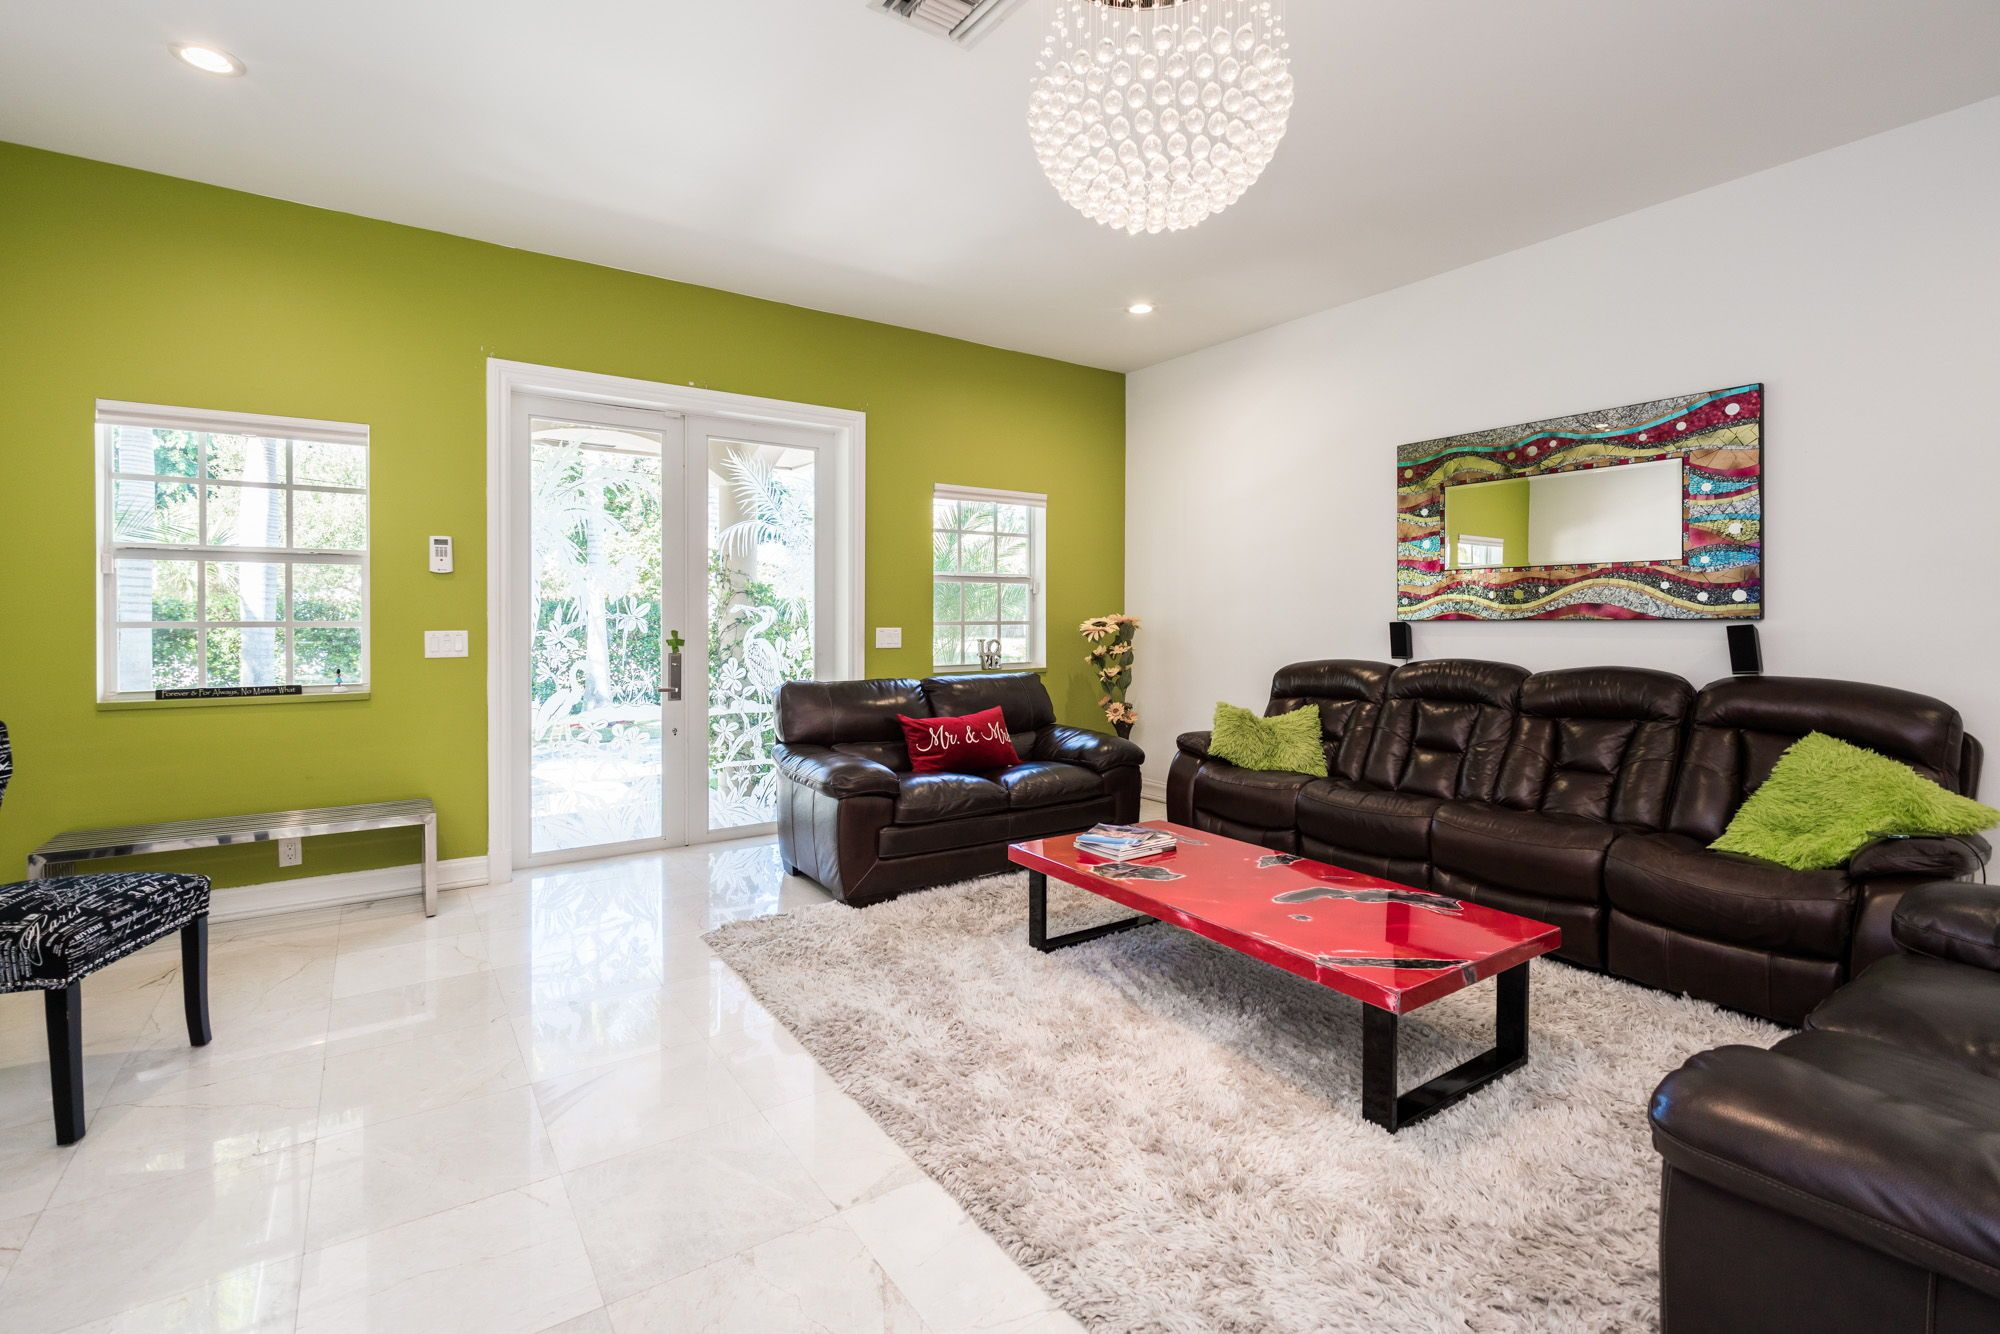 The Living Room Has Volume Ceilings Marble Flooring Glass Paned